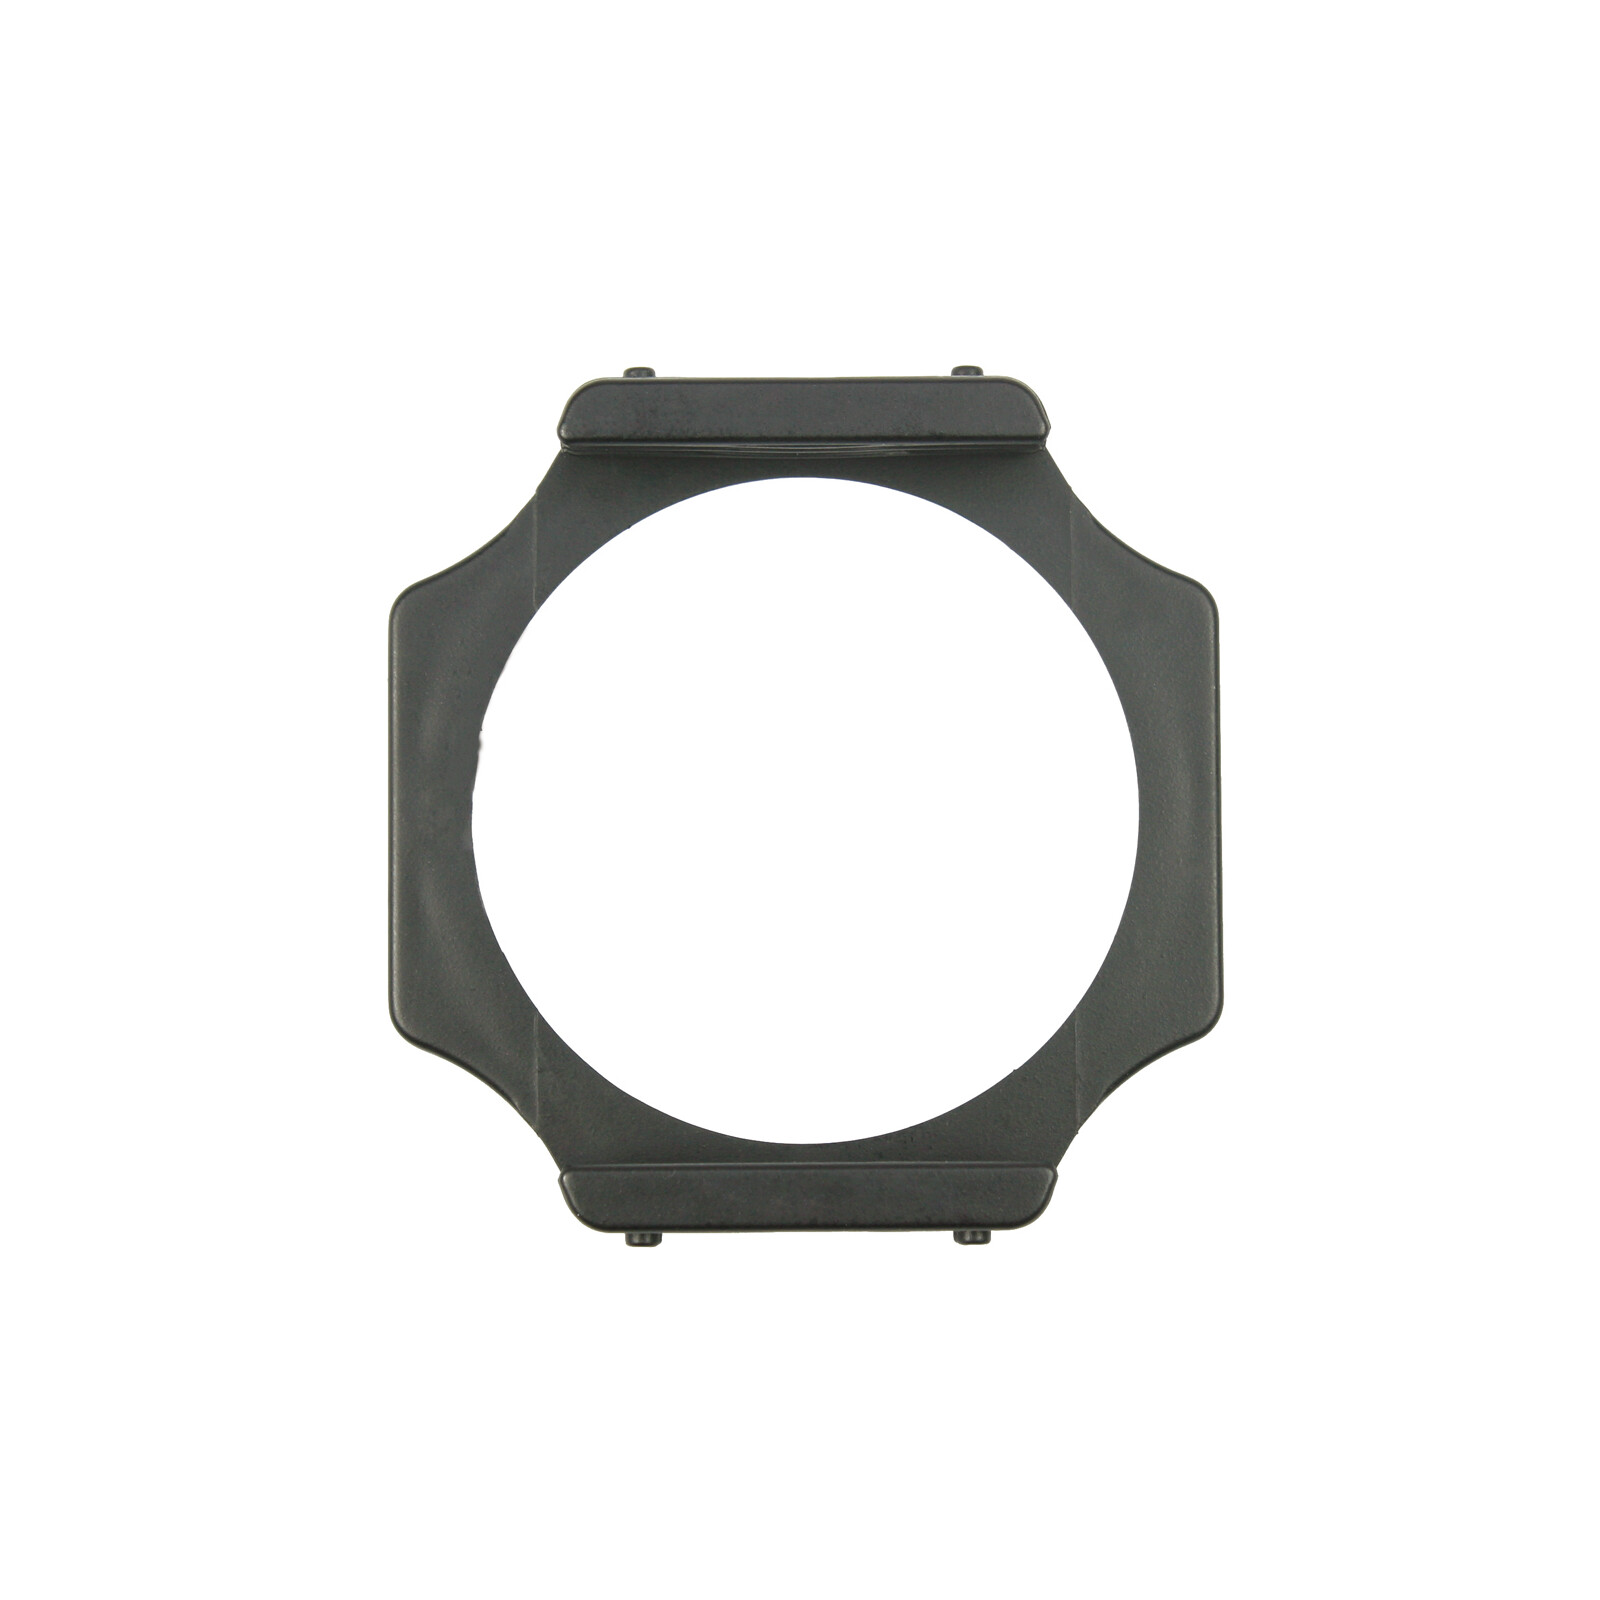 Dörr Go2 Metall Anschlussring 62mm